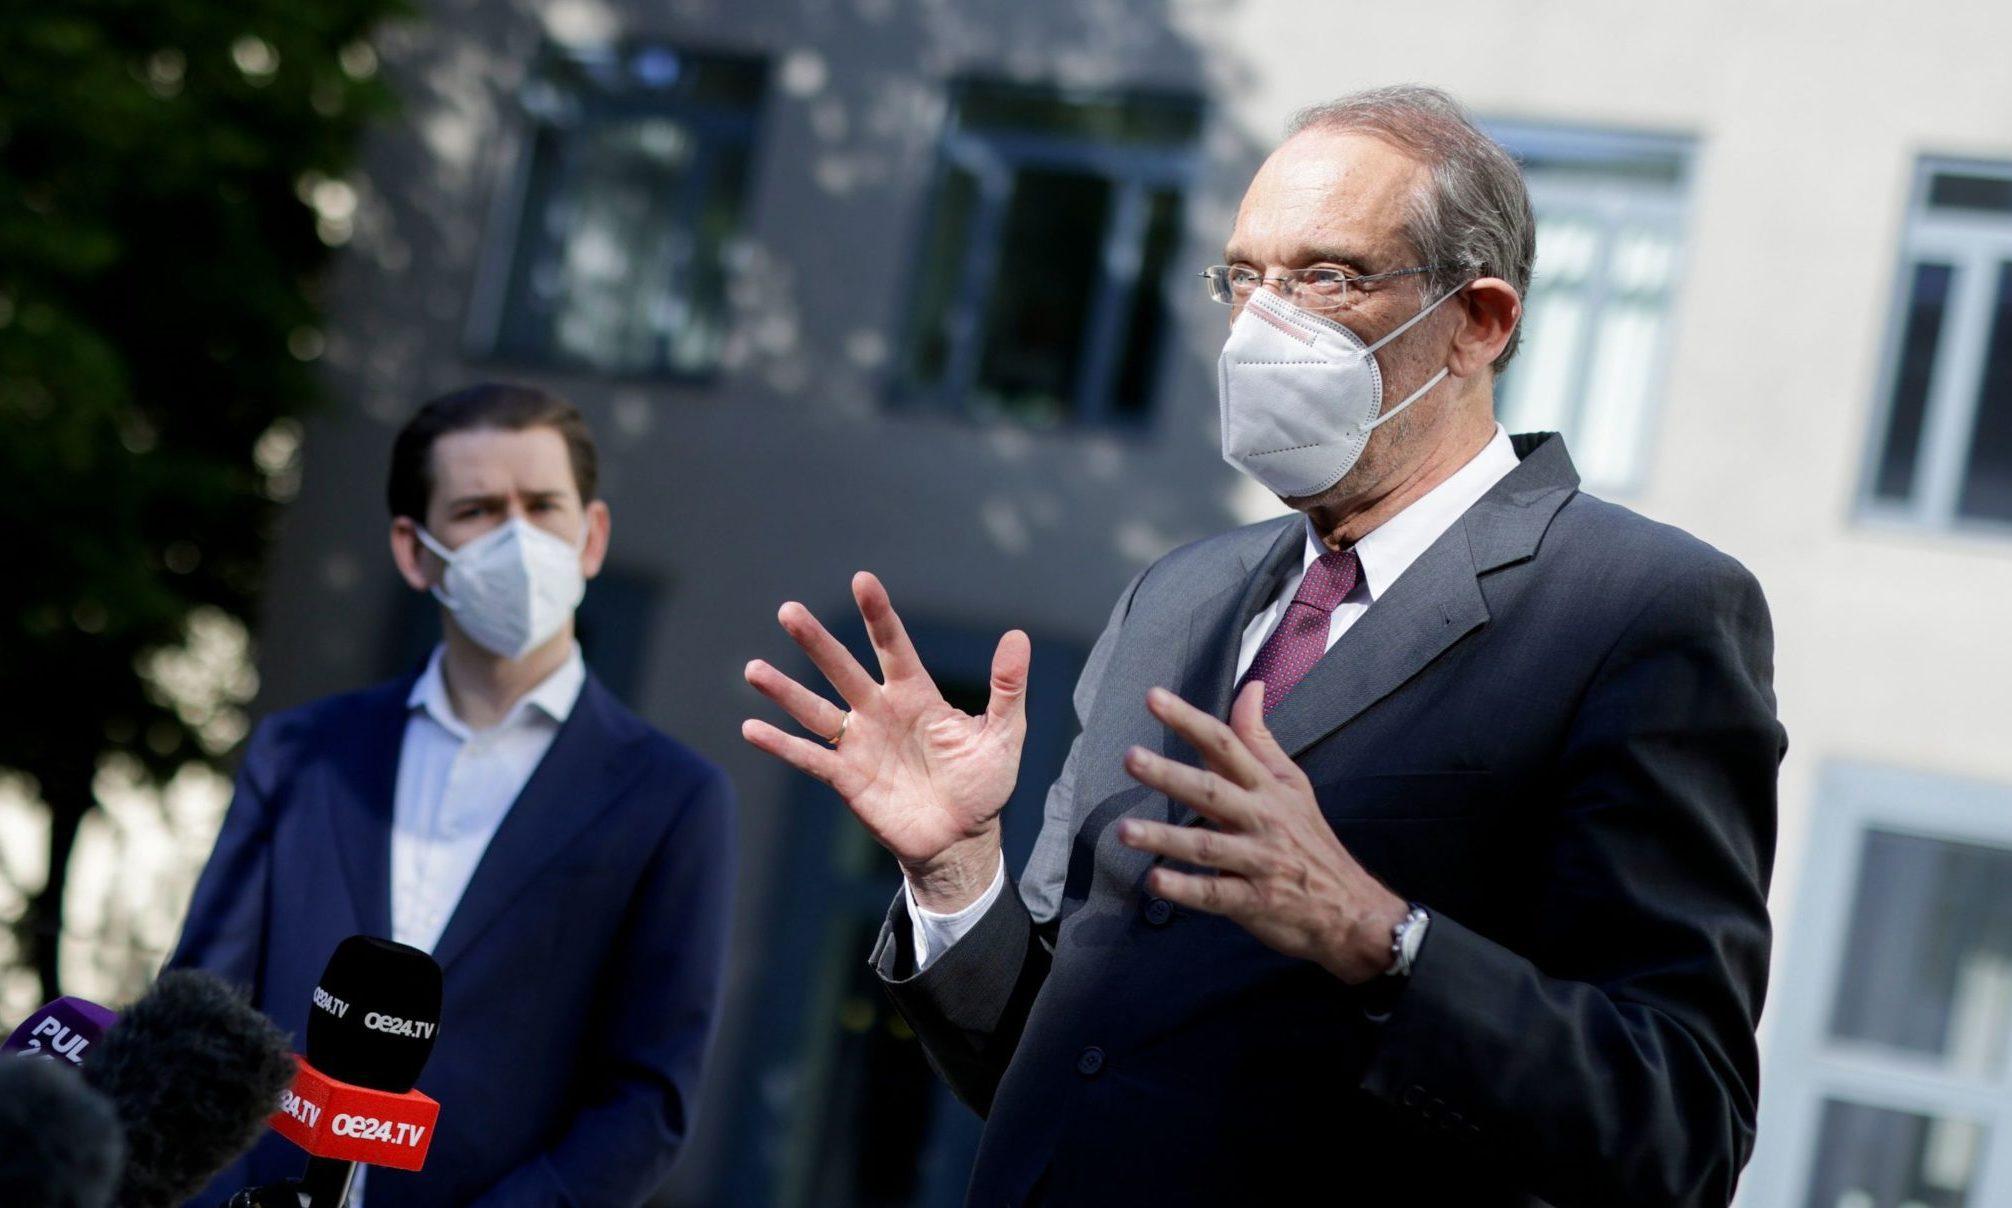 Heinz Faßmann und Sebastian Kurz mit Maske